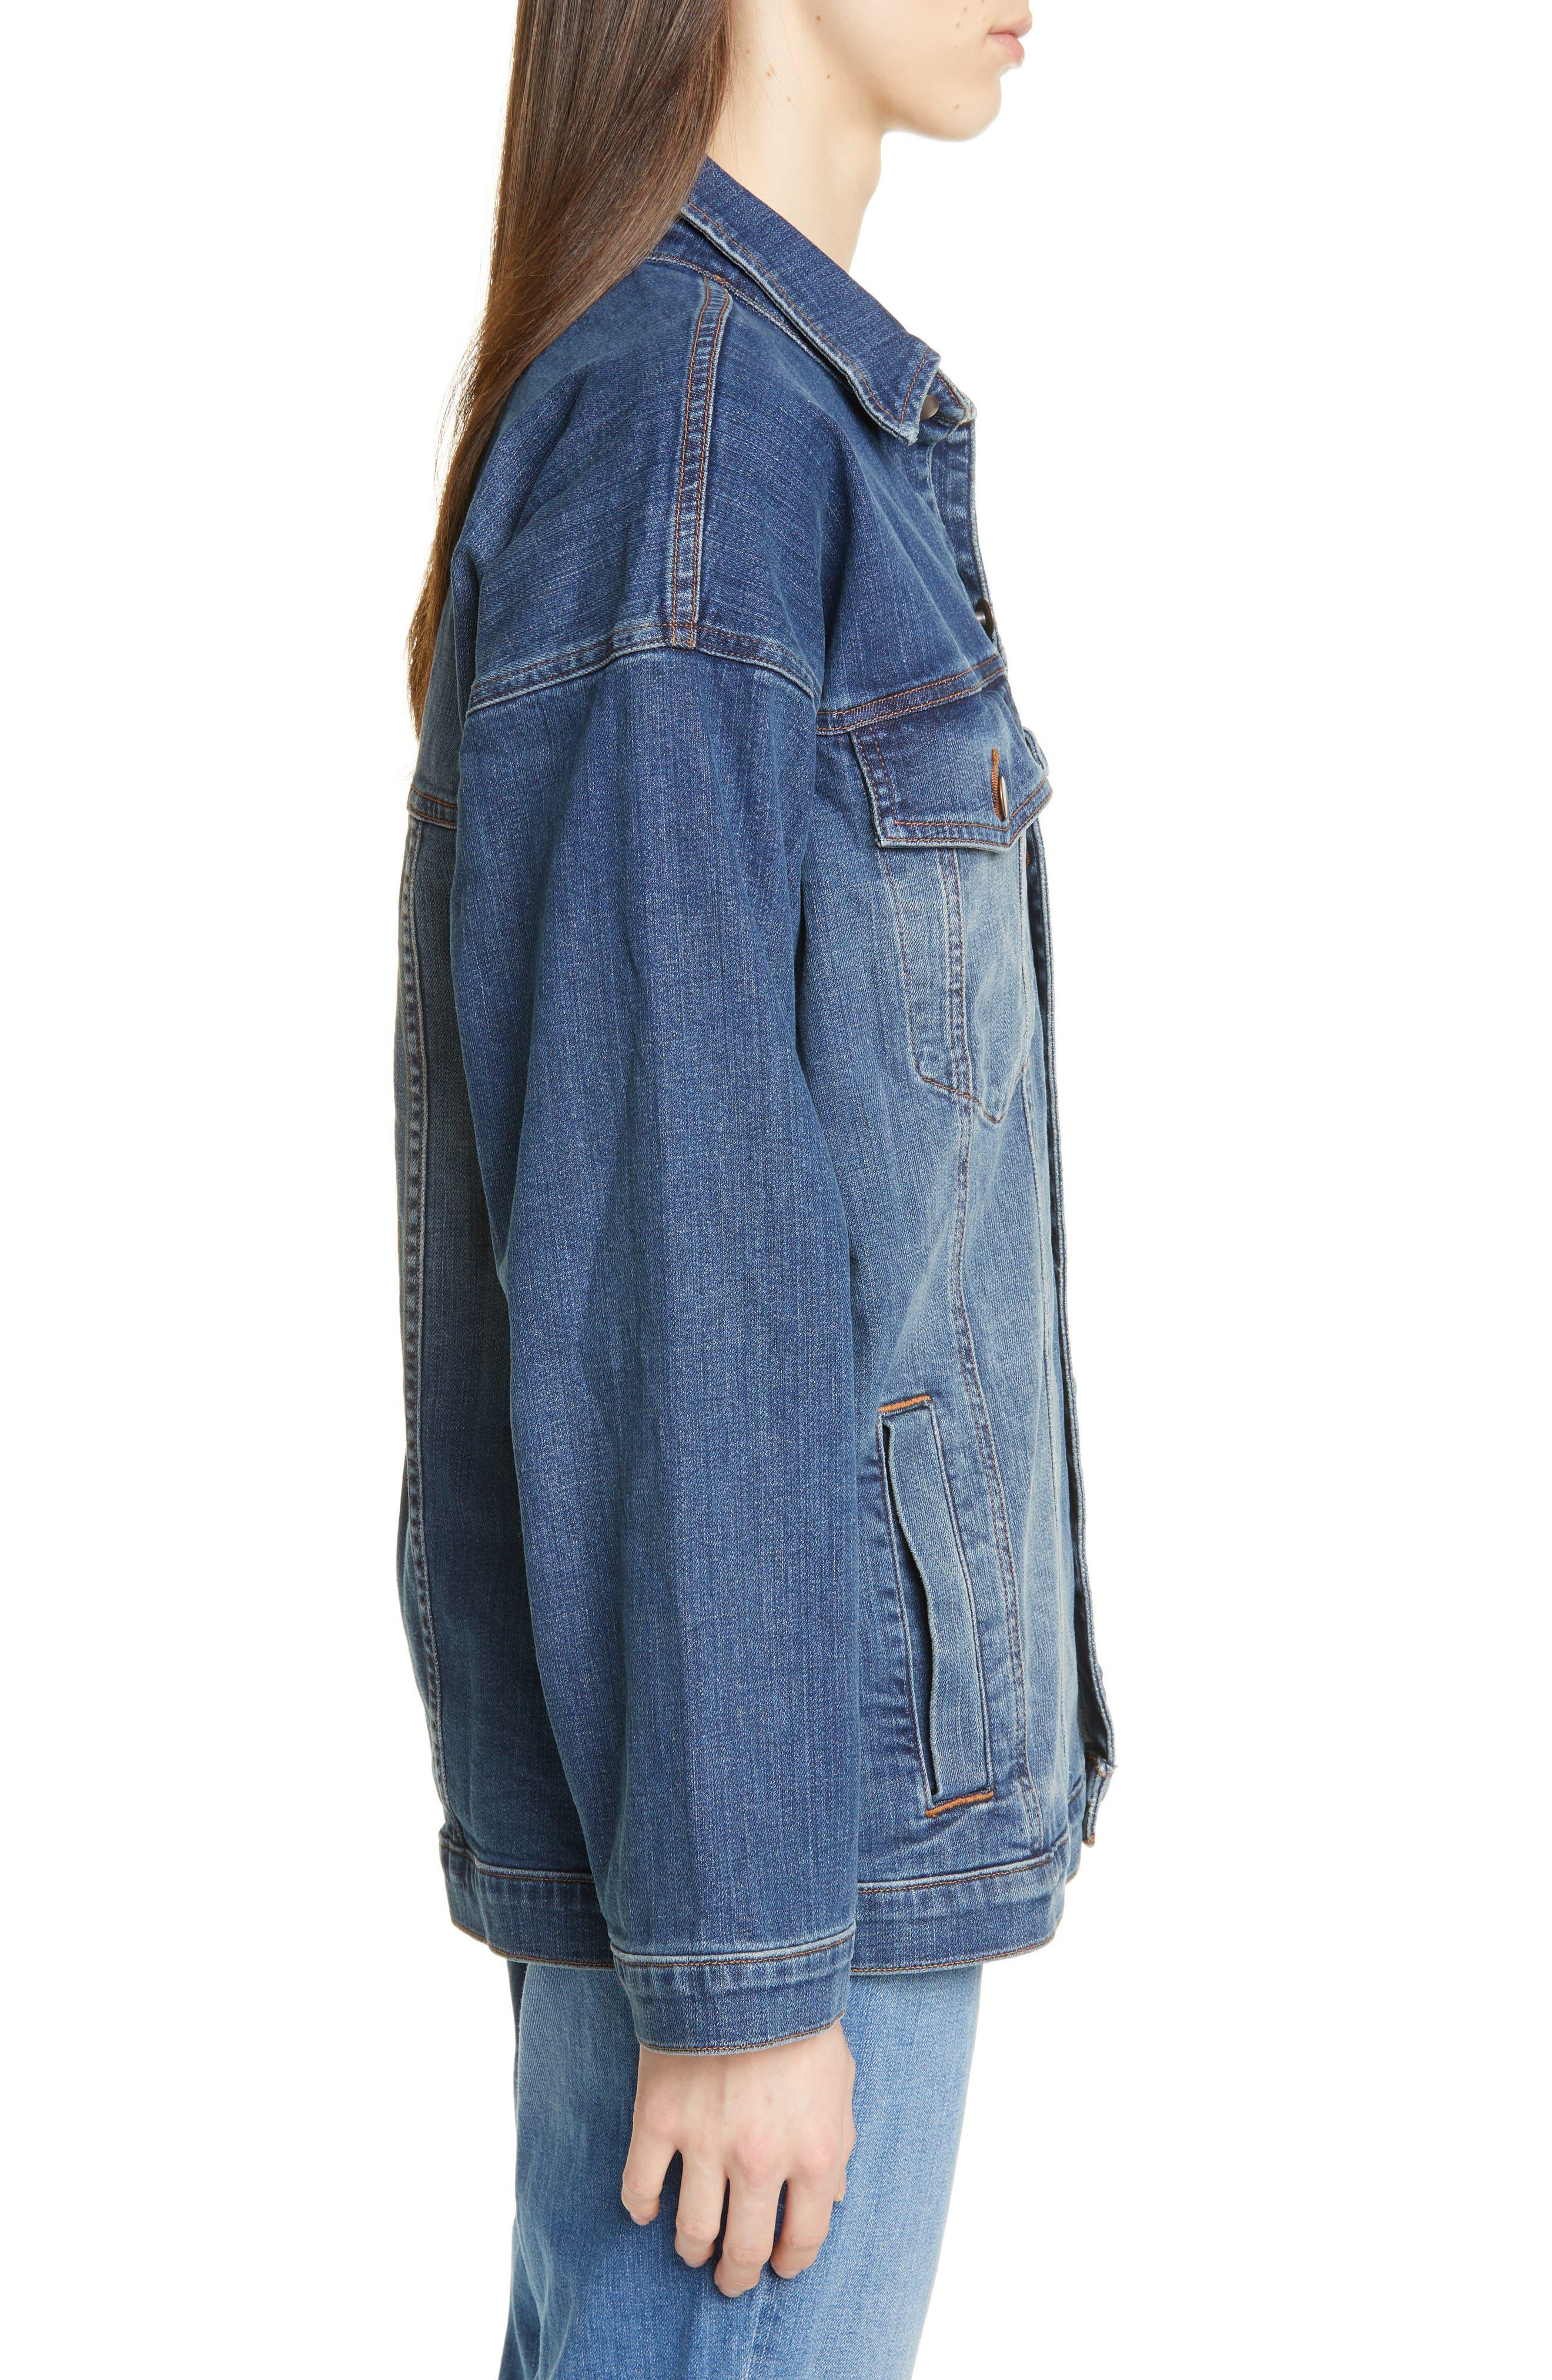 EILEEN FISHER, Oversize Stretch Organic Cotton Denim Jacket, Alternate thumbnail 4, color, AGED INDIGO